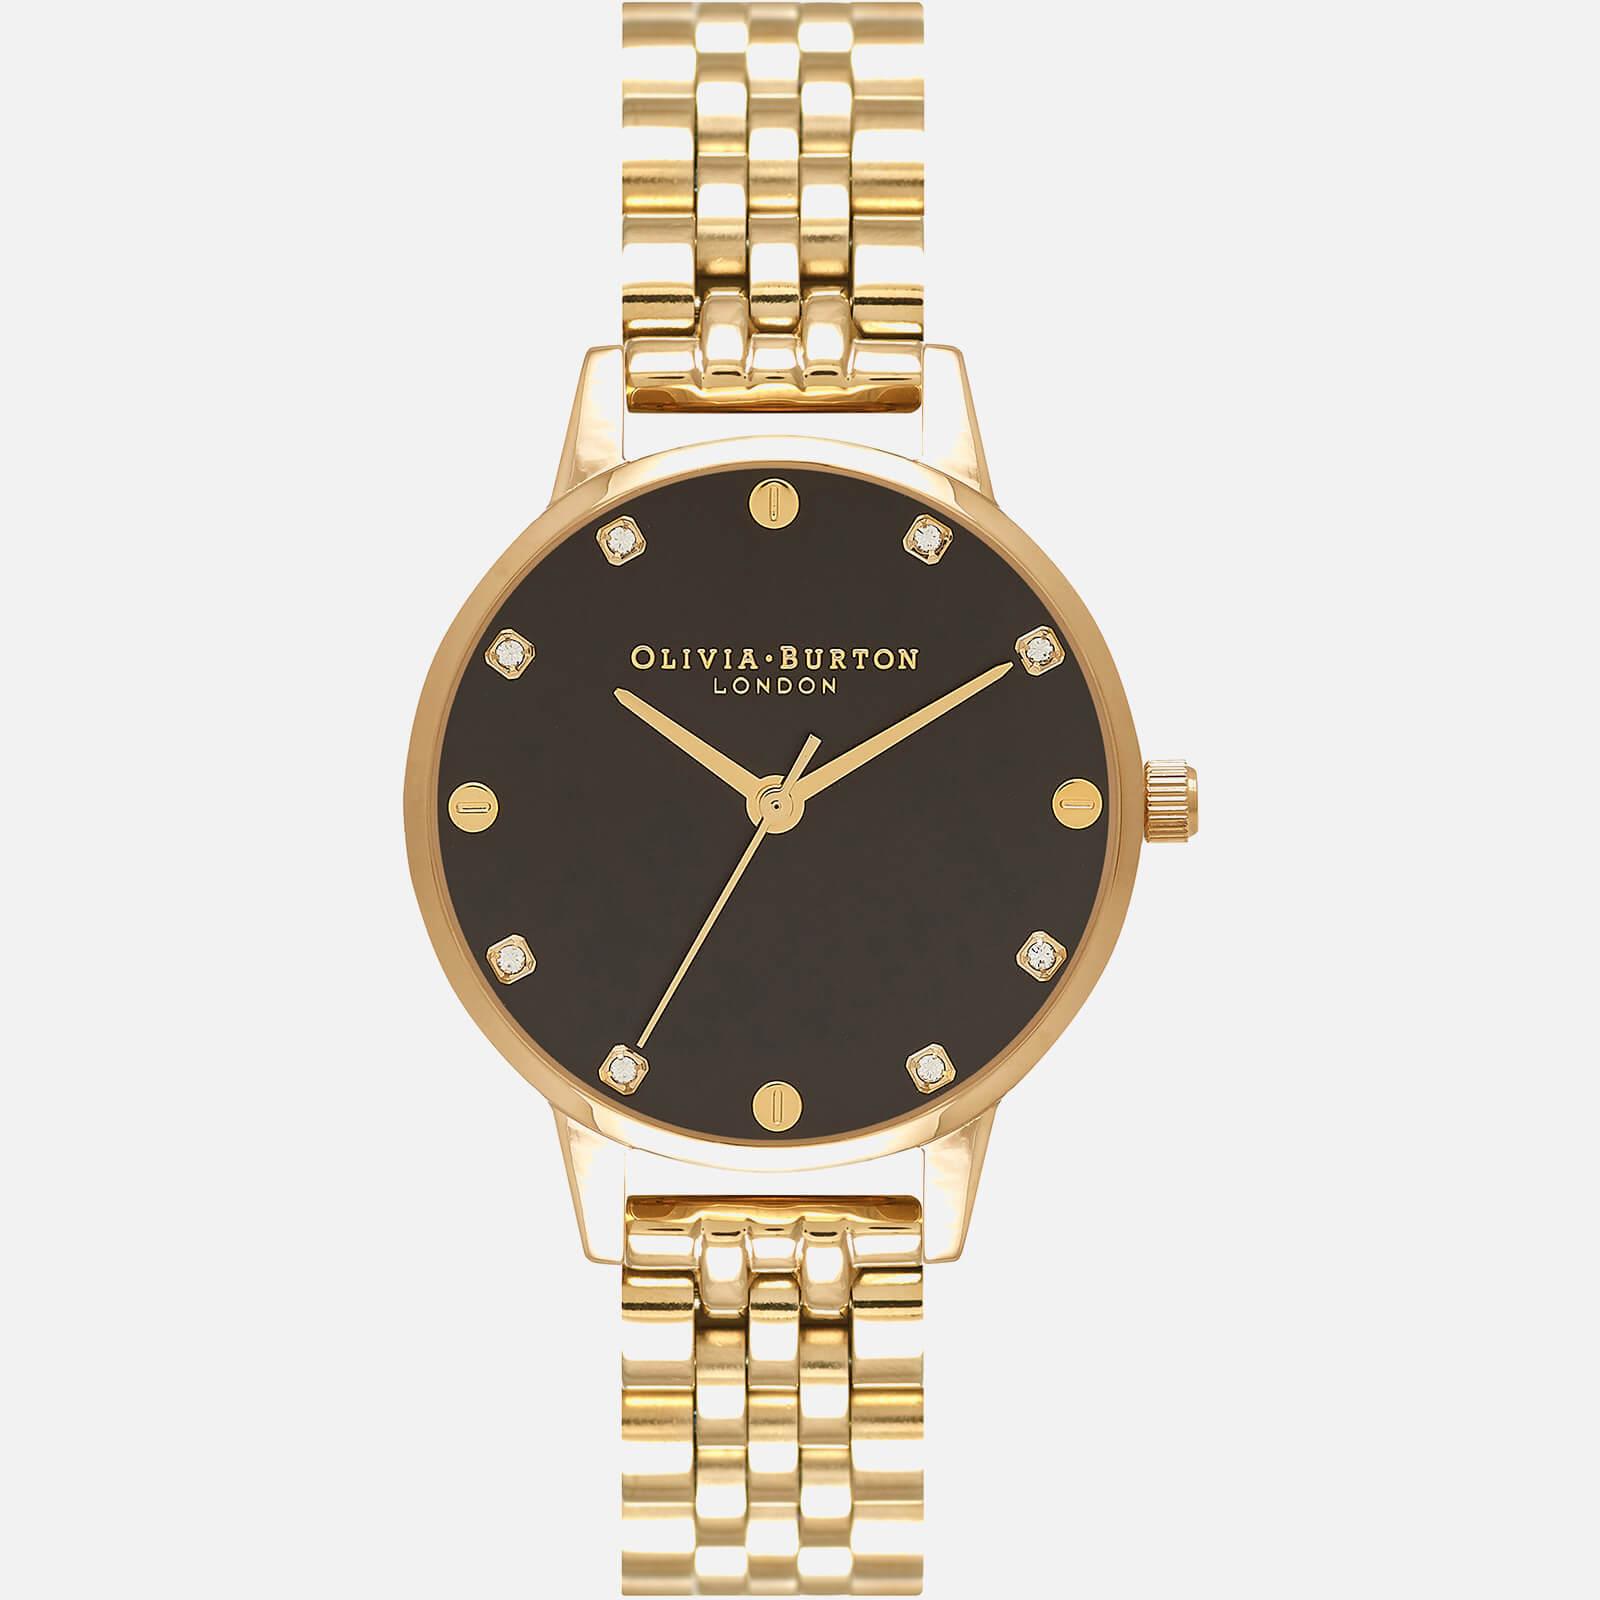 Olivia Burton Women's Classics Collection Watch - Black & Gold